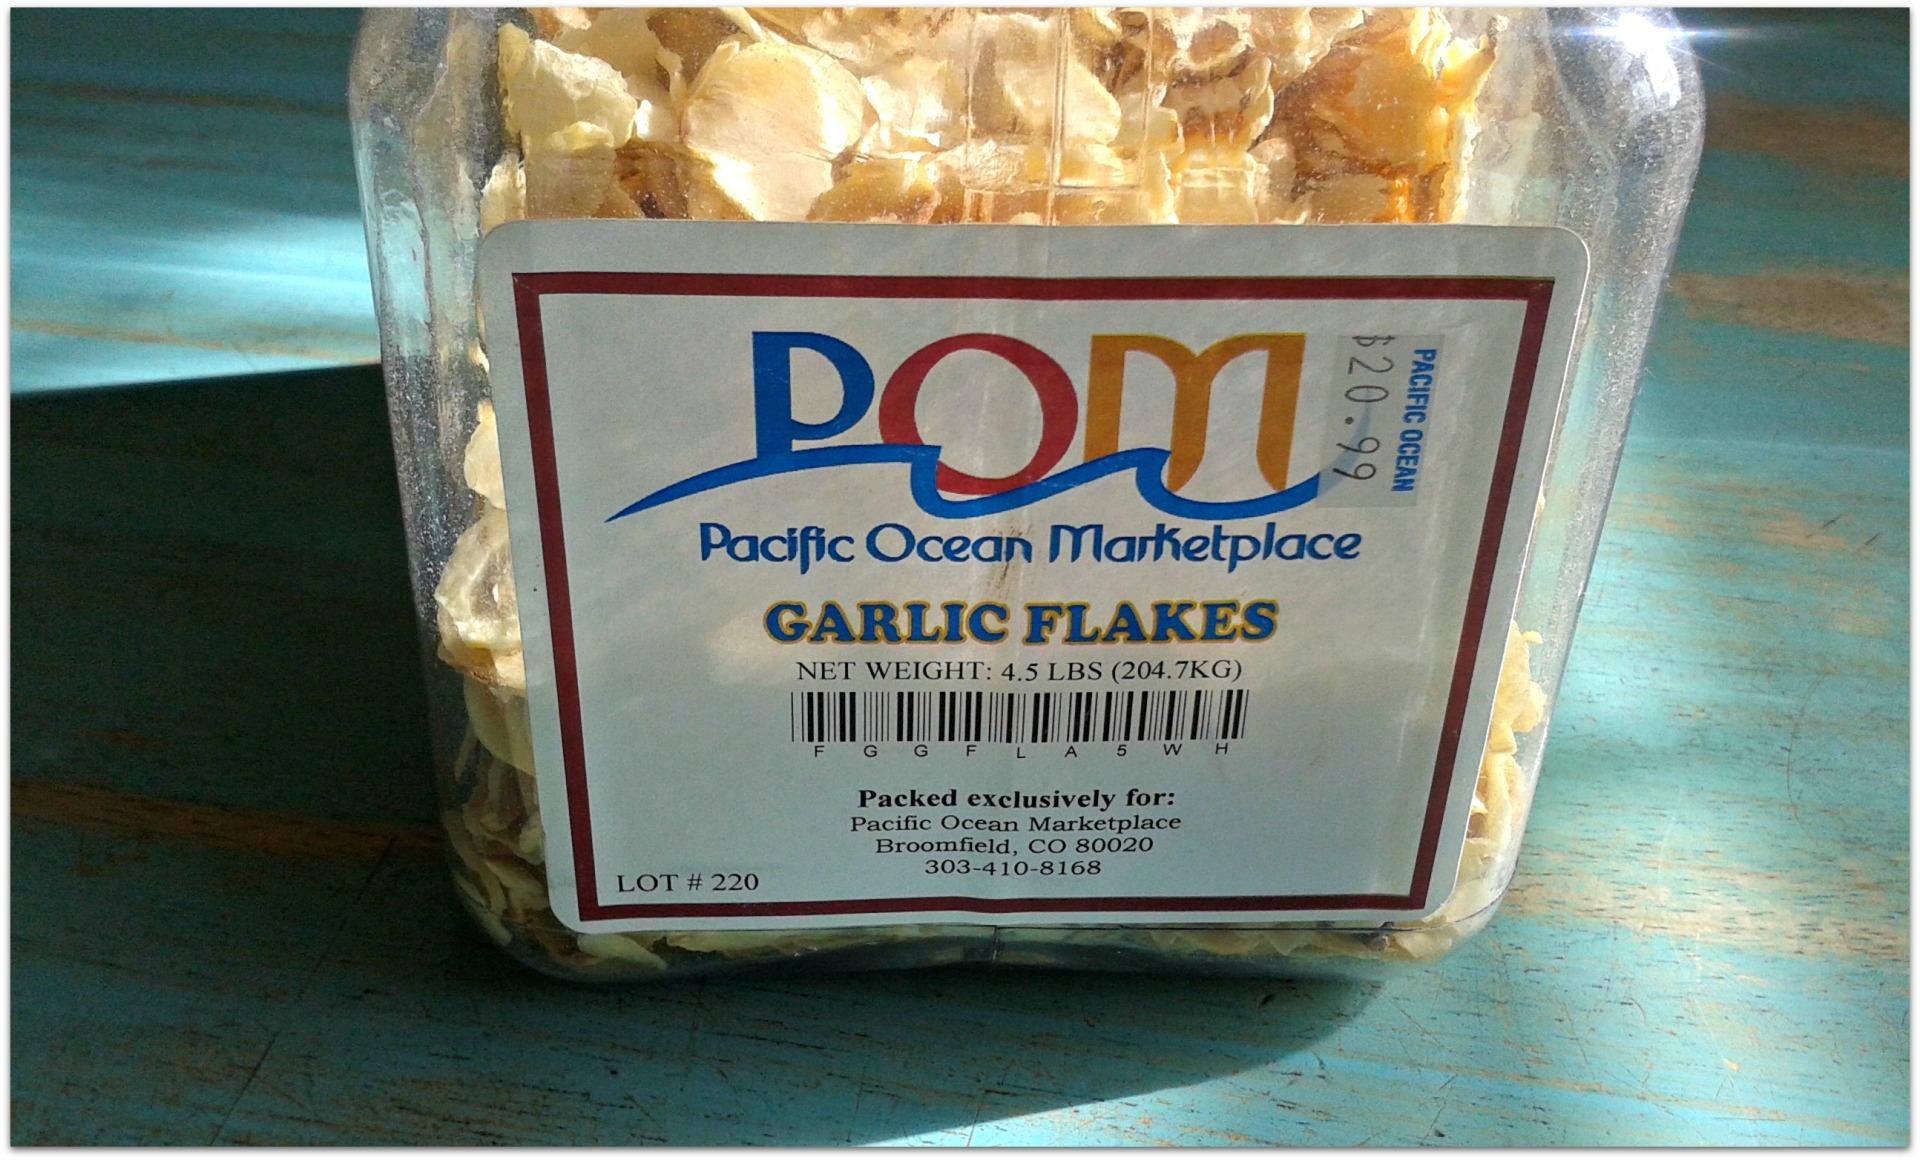 garlic flakes jar label